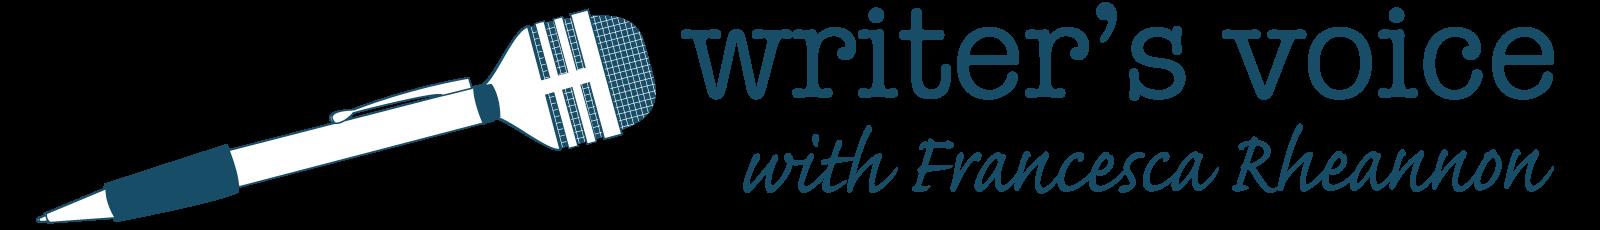 Writer's Voice